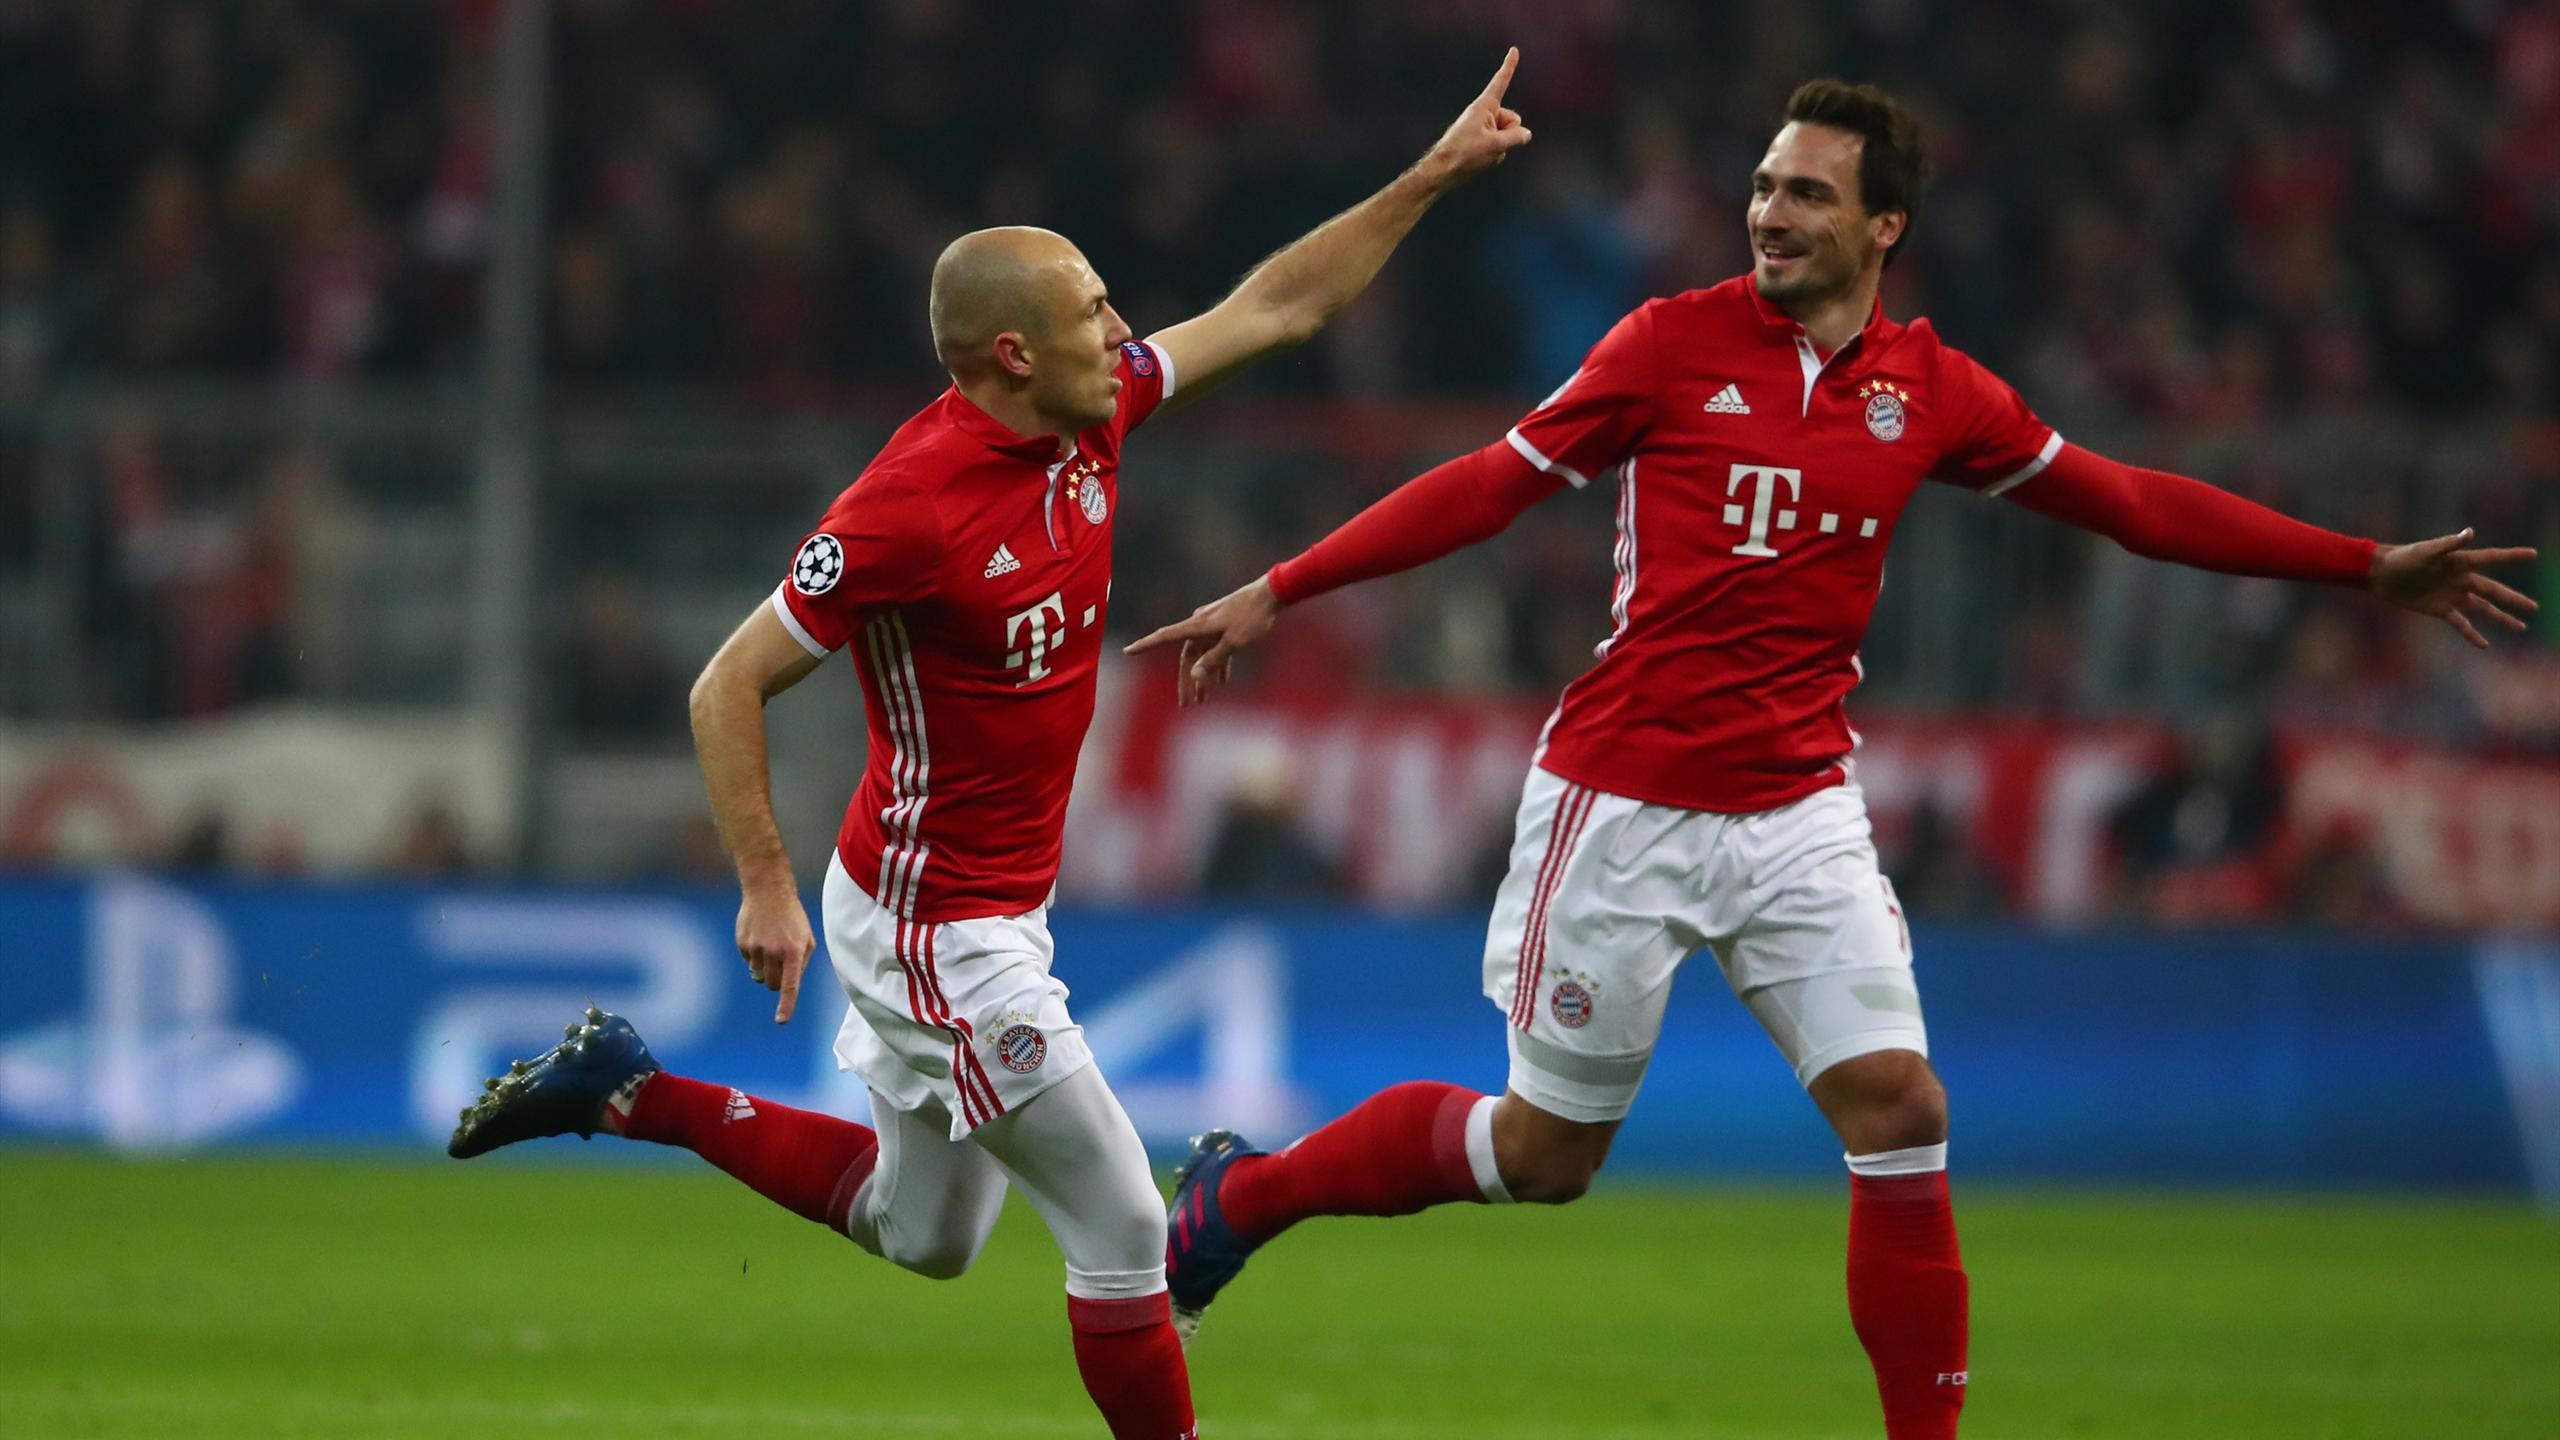 Bayern Munich's Arjen Robben celebrates scoring against Arsenal with Mats Hummels